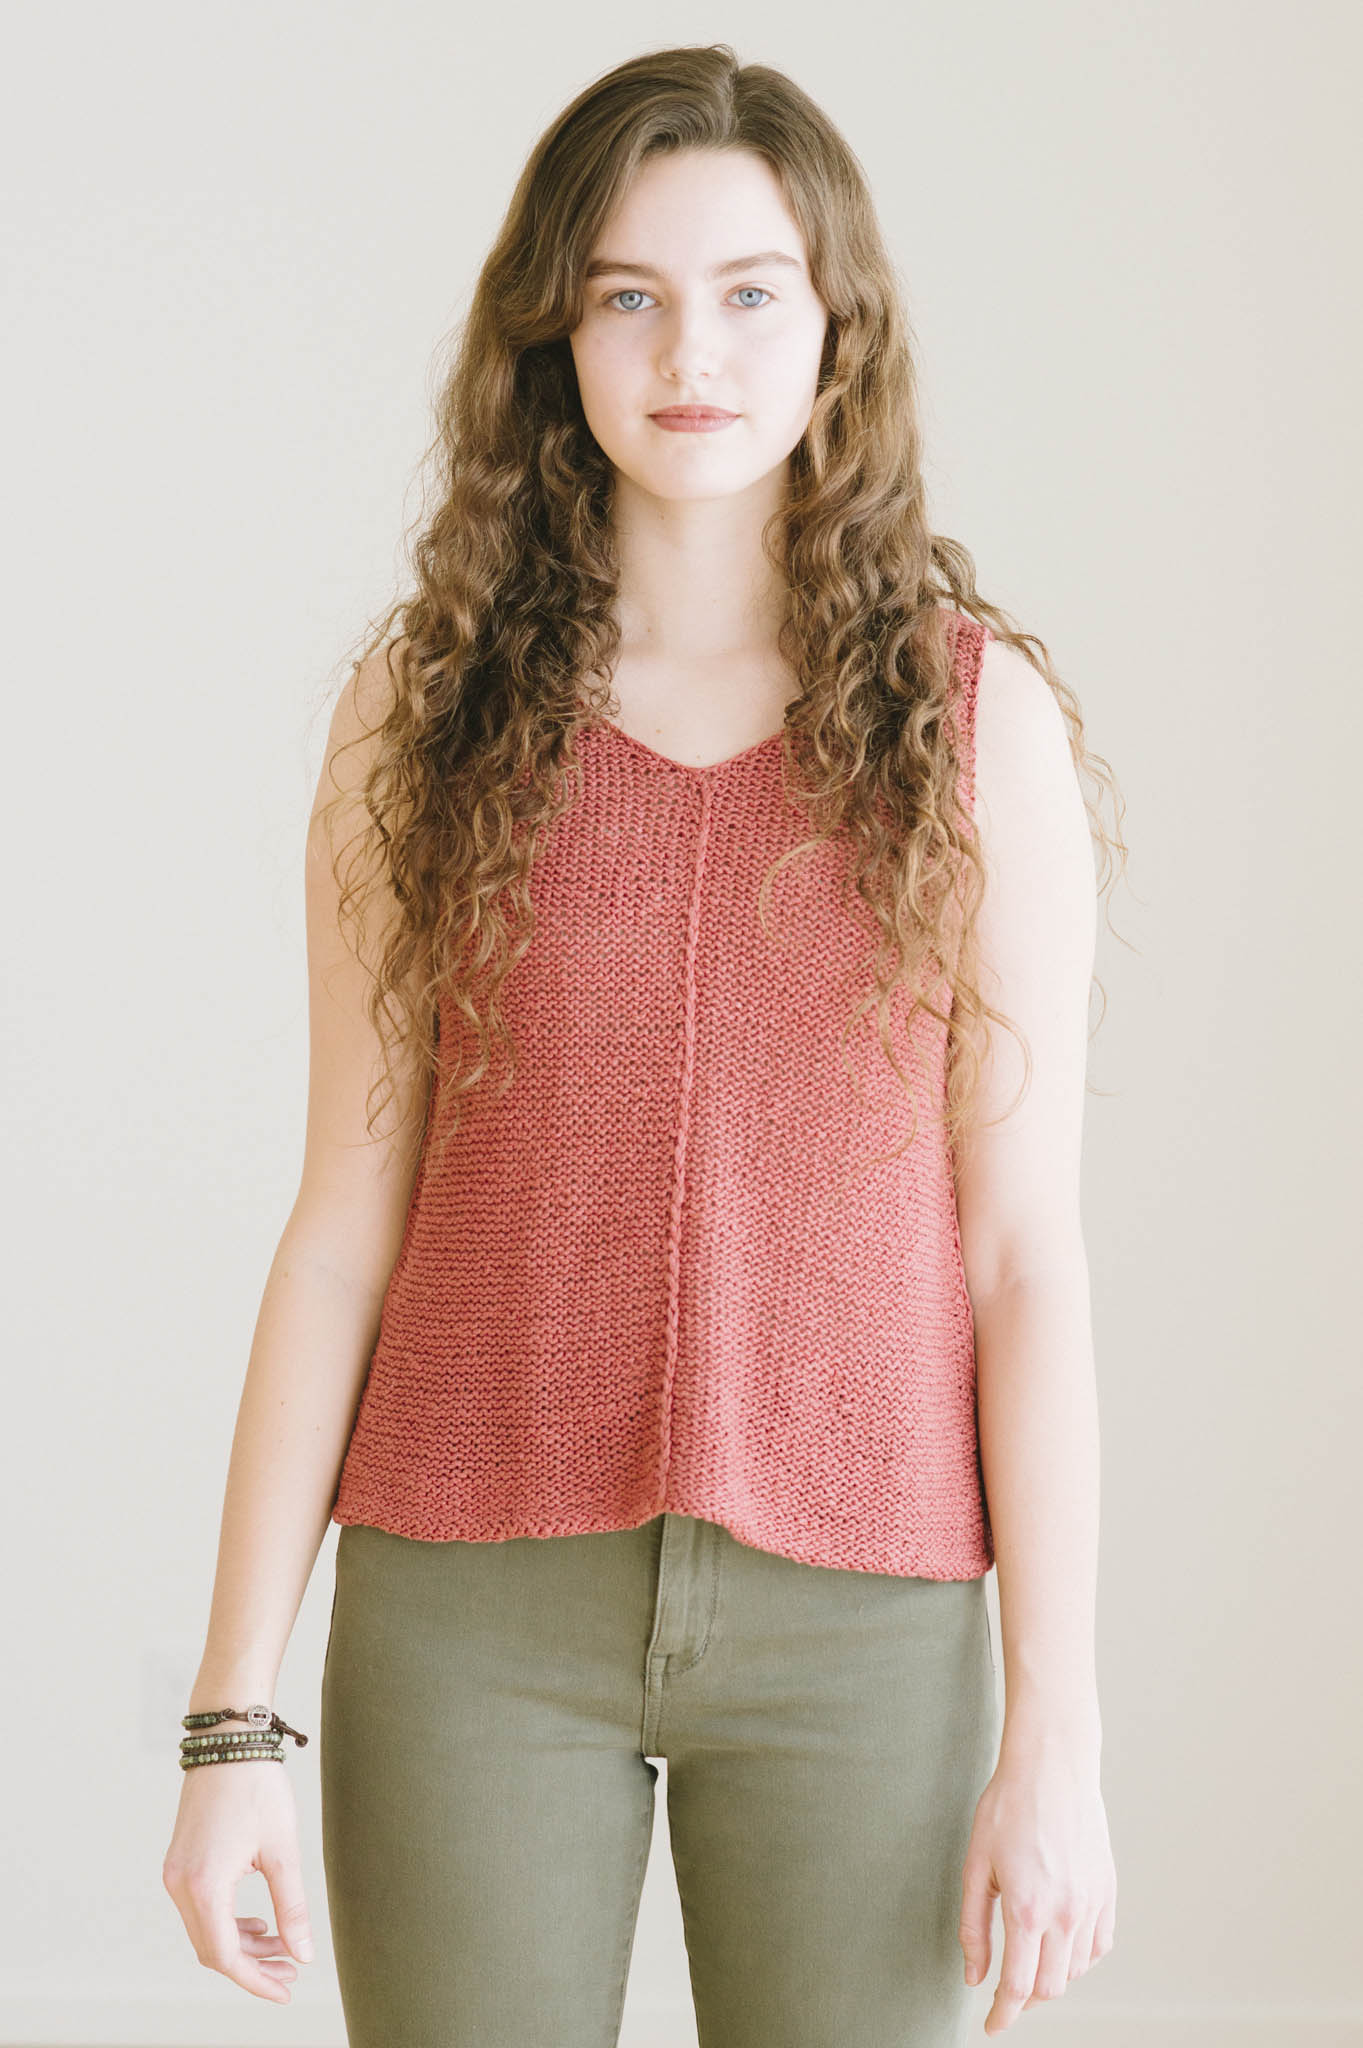 quince-co-tamsin-dawn-catanzaro-knitting-pattern-kestrel-1.jpg